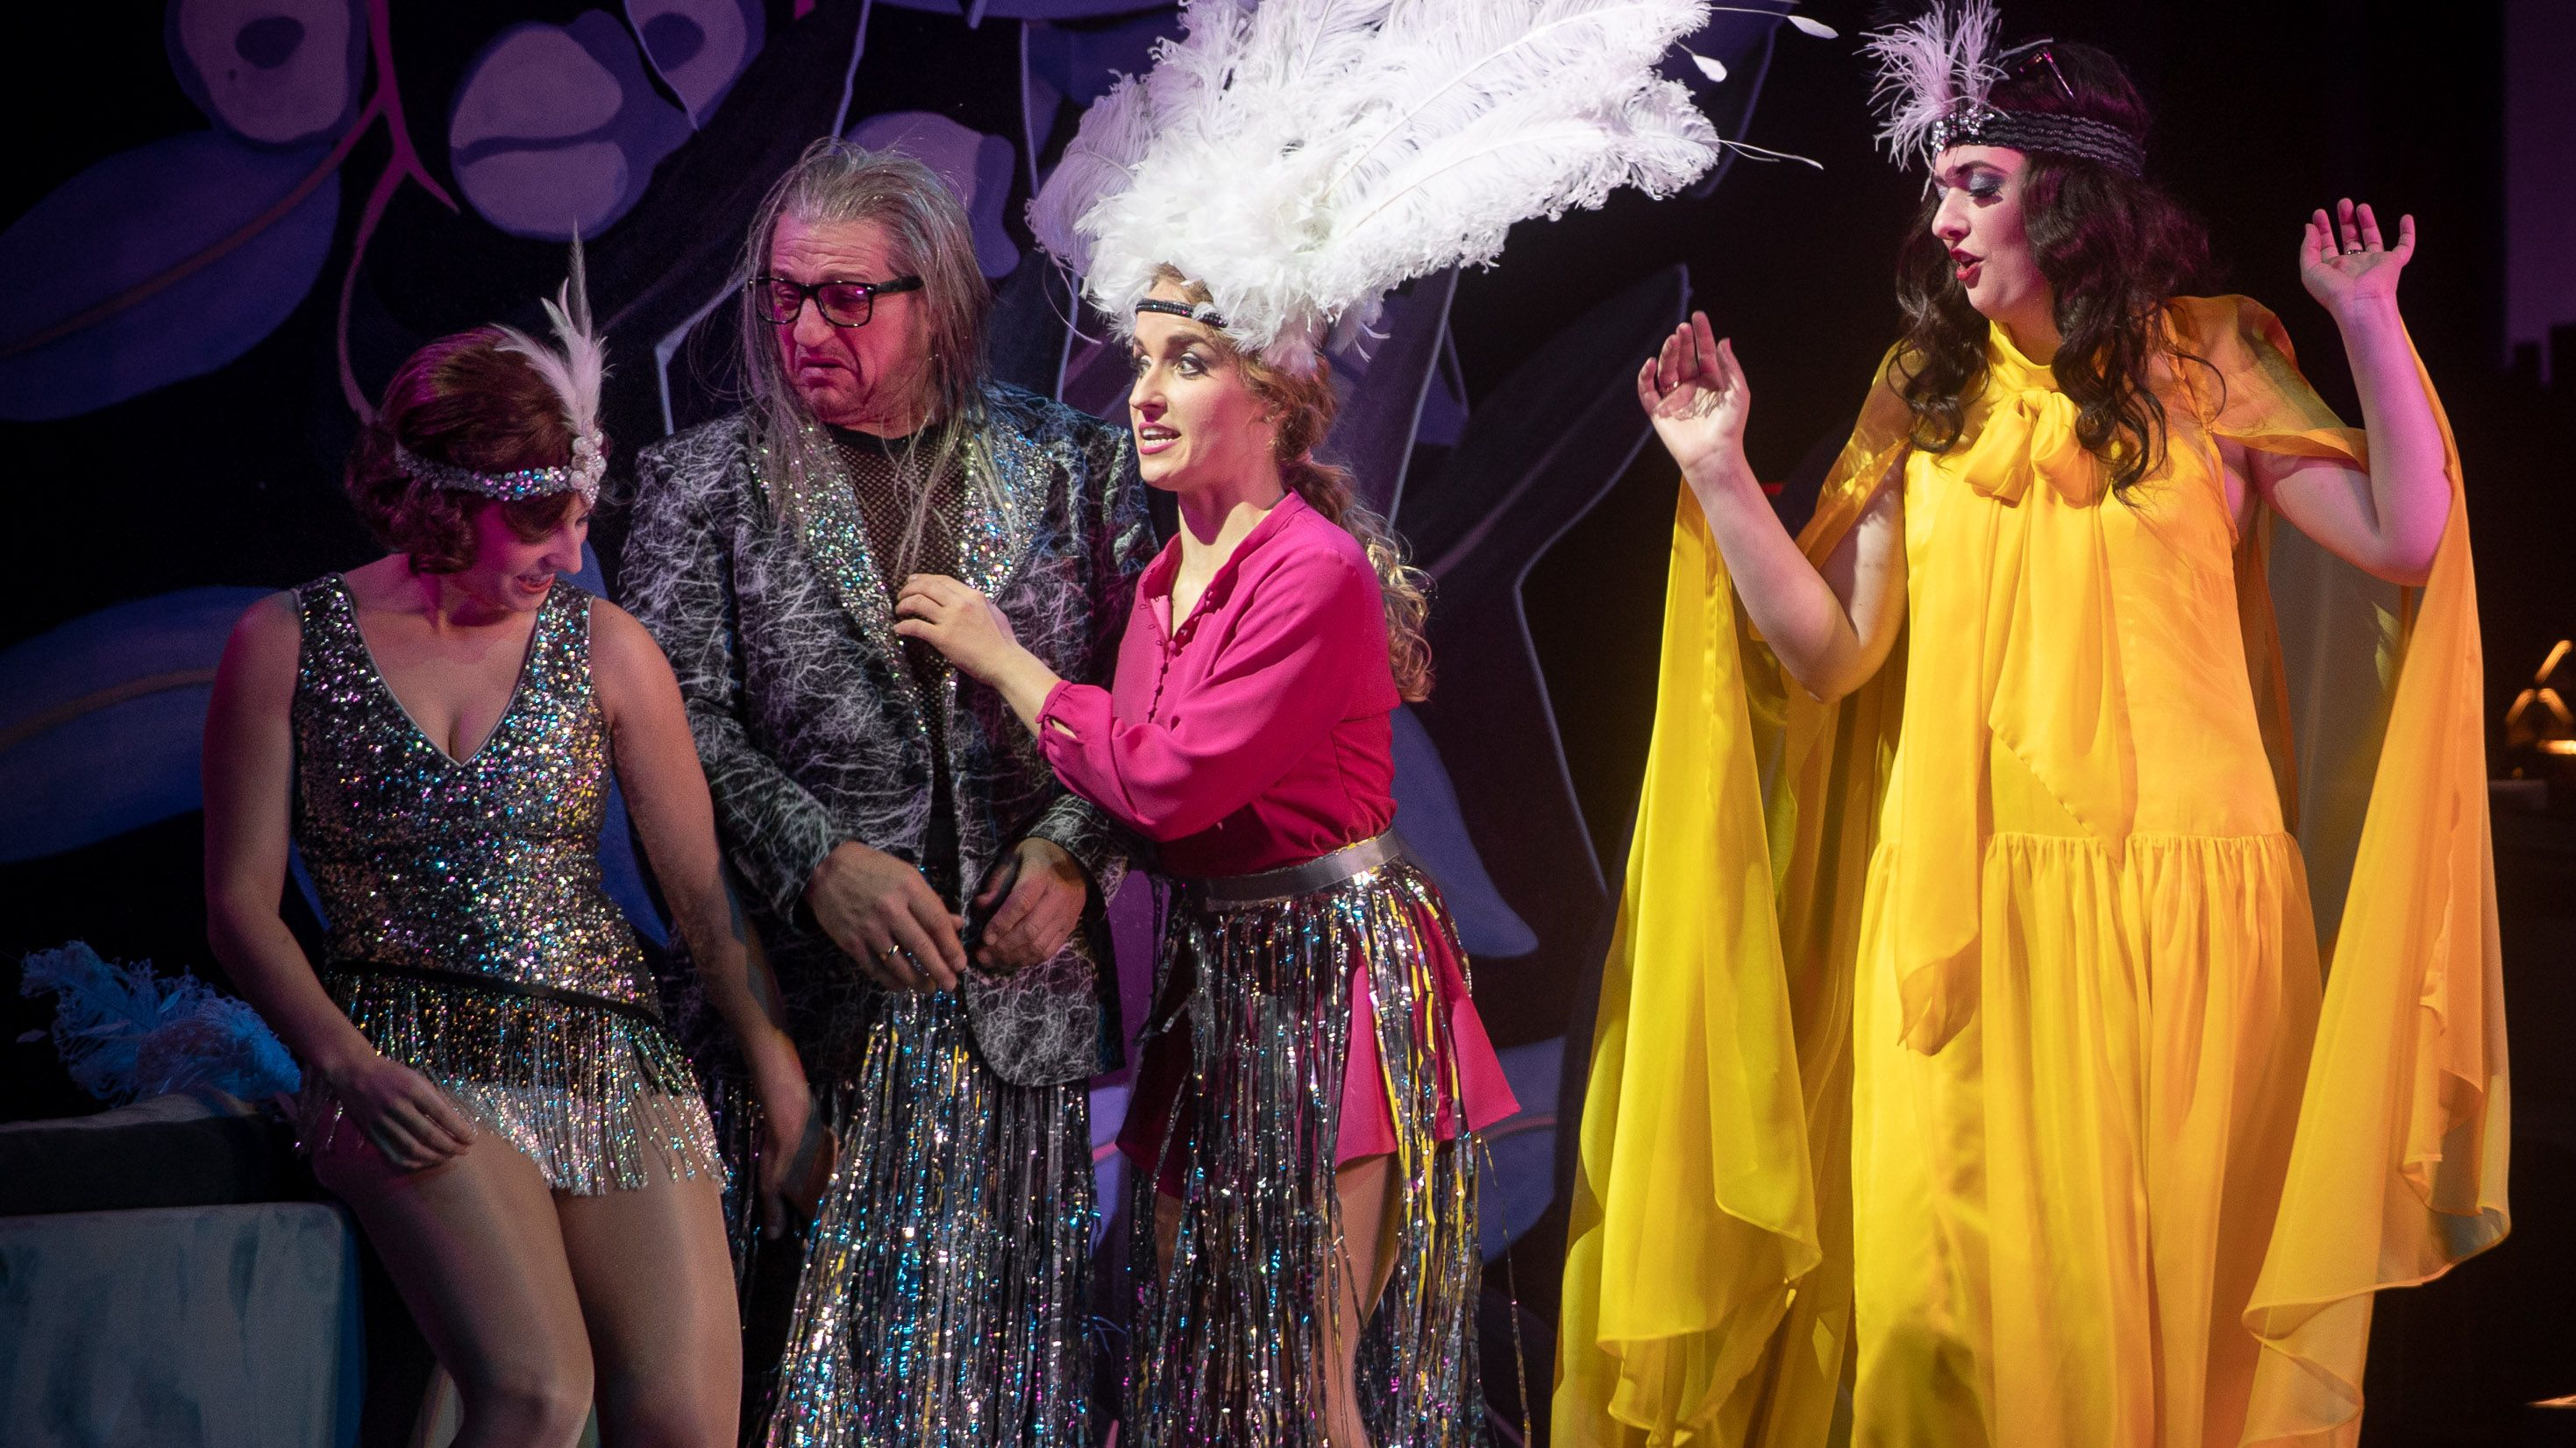 Trashige Revue in Coburg